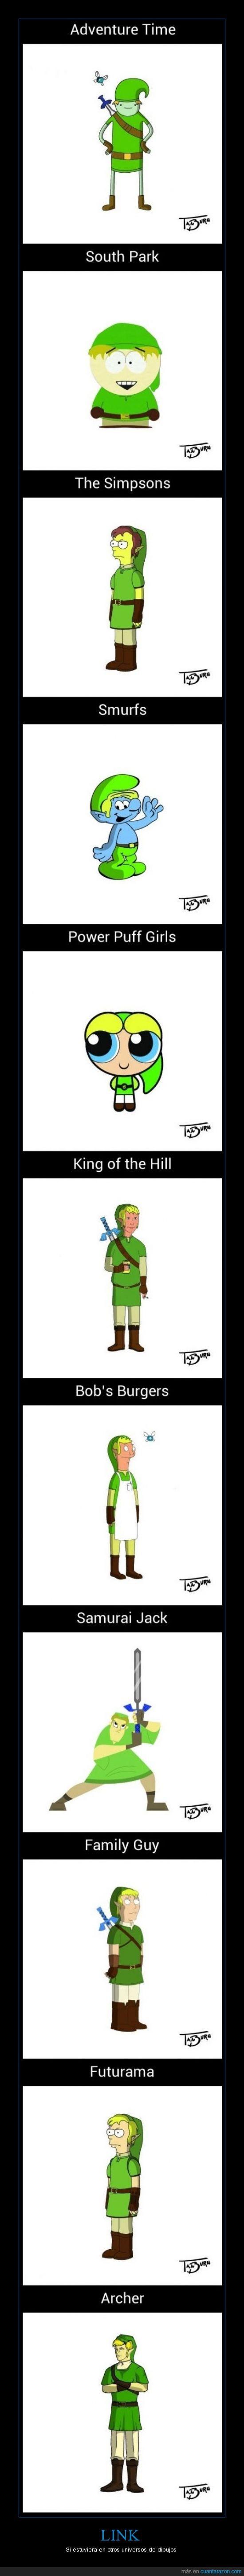 adventure time,Archer,bob's burgers,Family guy,Futurama,hora de aventuras,king of the hill,Link,los pitufos,los simpsons,padre de familia,powerpuff girls,reyes de la colina,samurai jack,smurfs,south park,videojuegos,zelda